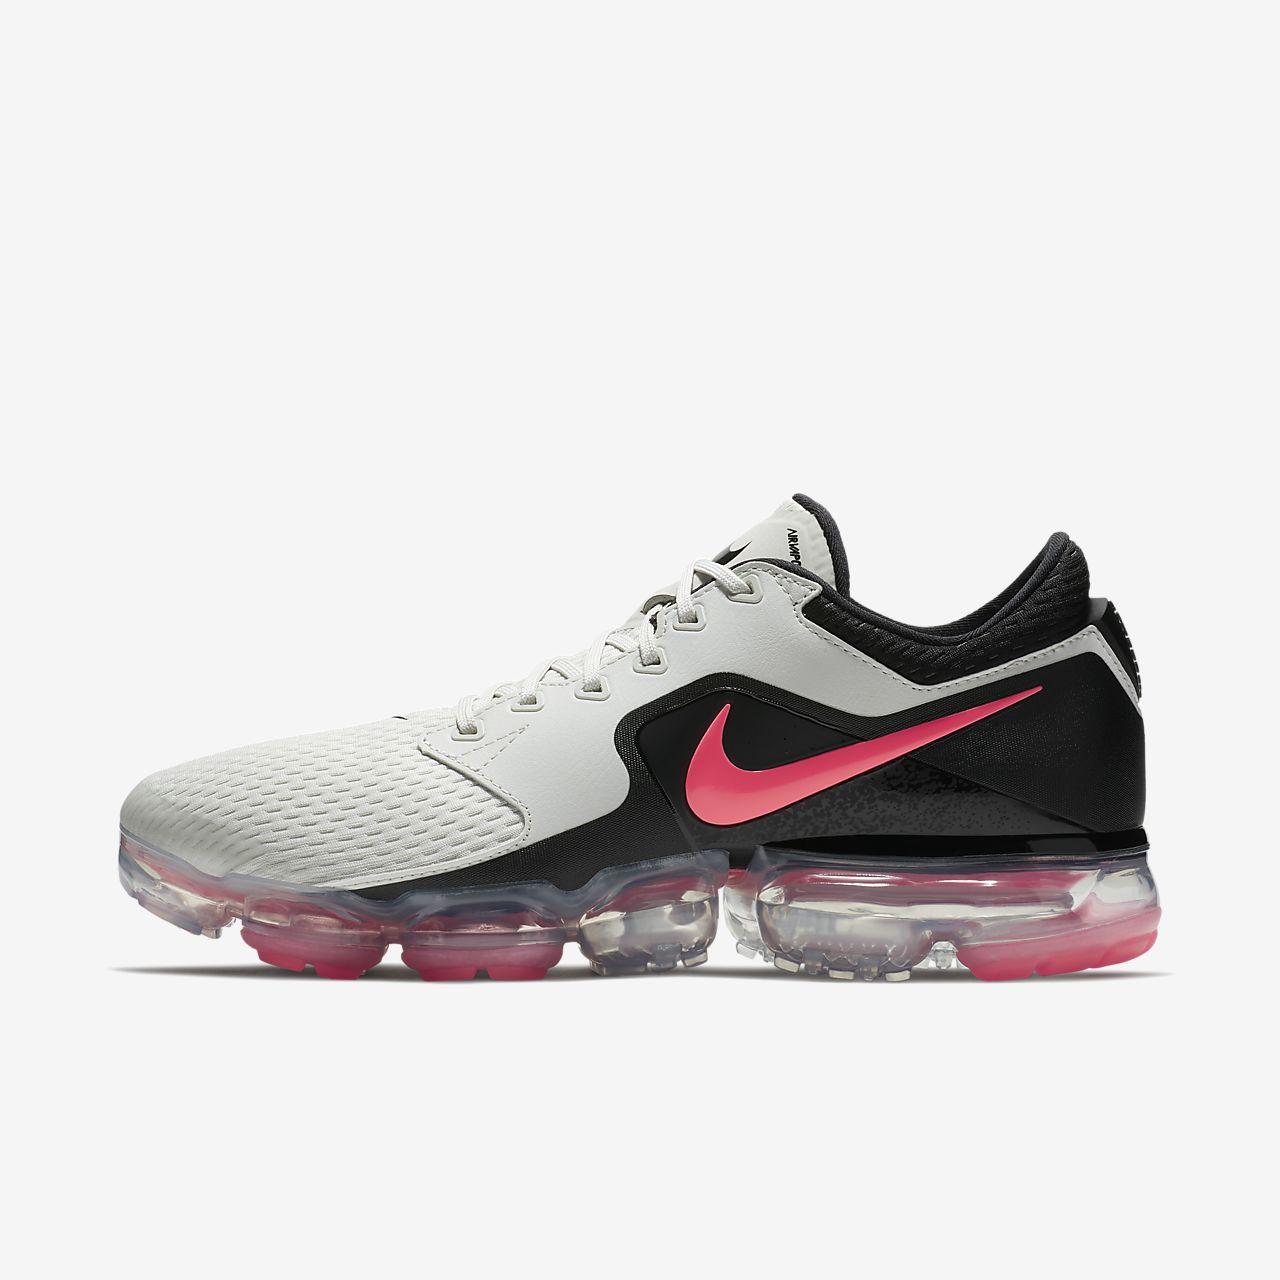 Pour Air Chaussure Homme Nike Ma Vapormax FT5xPw5t